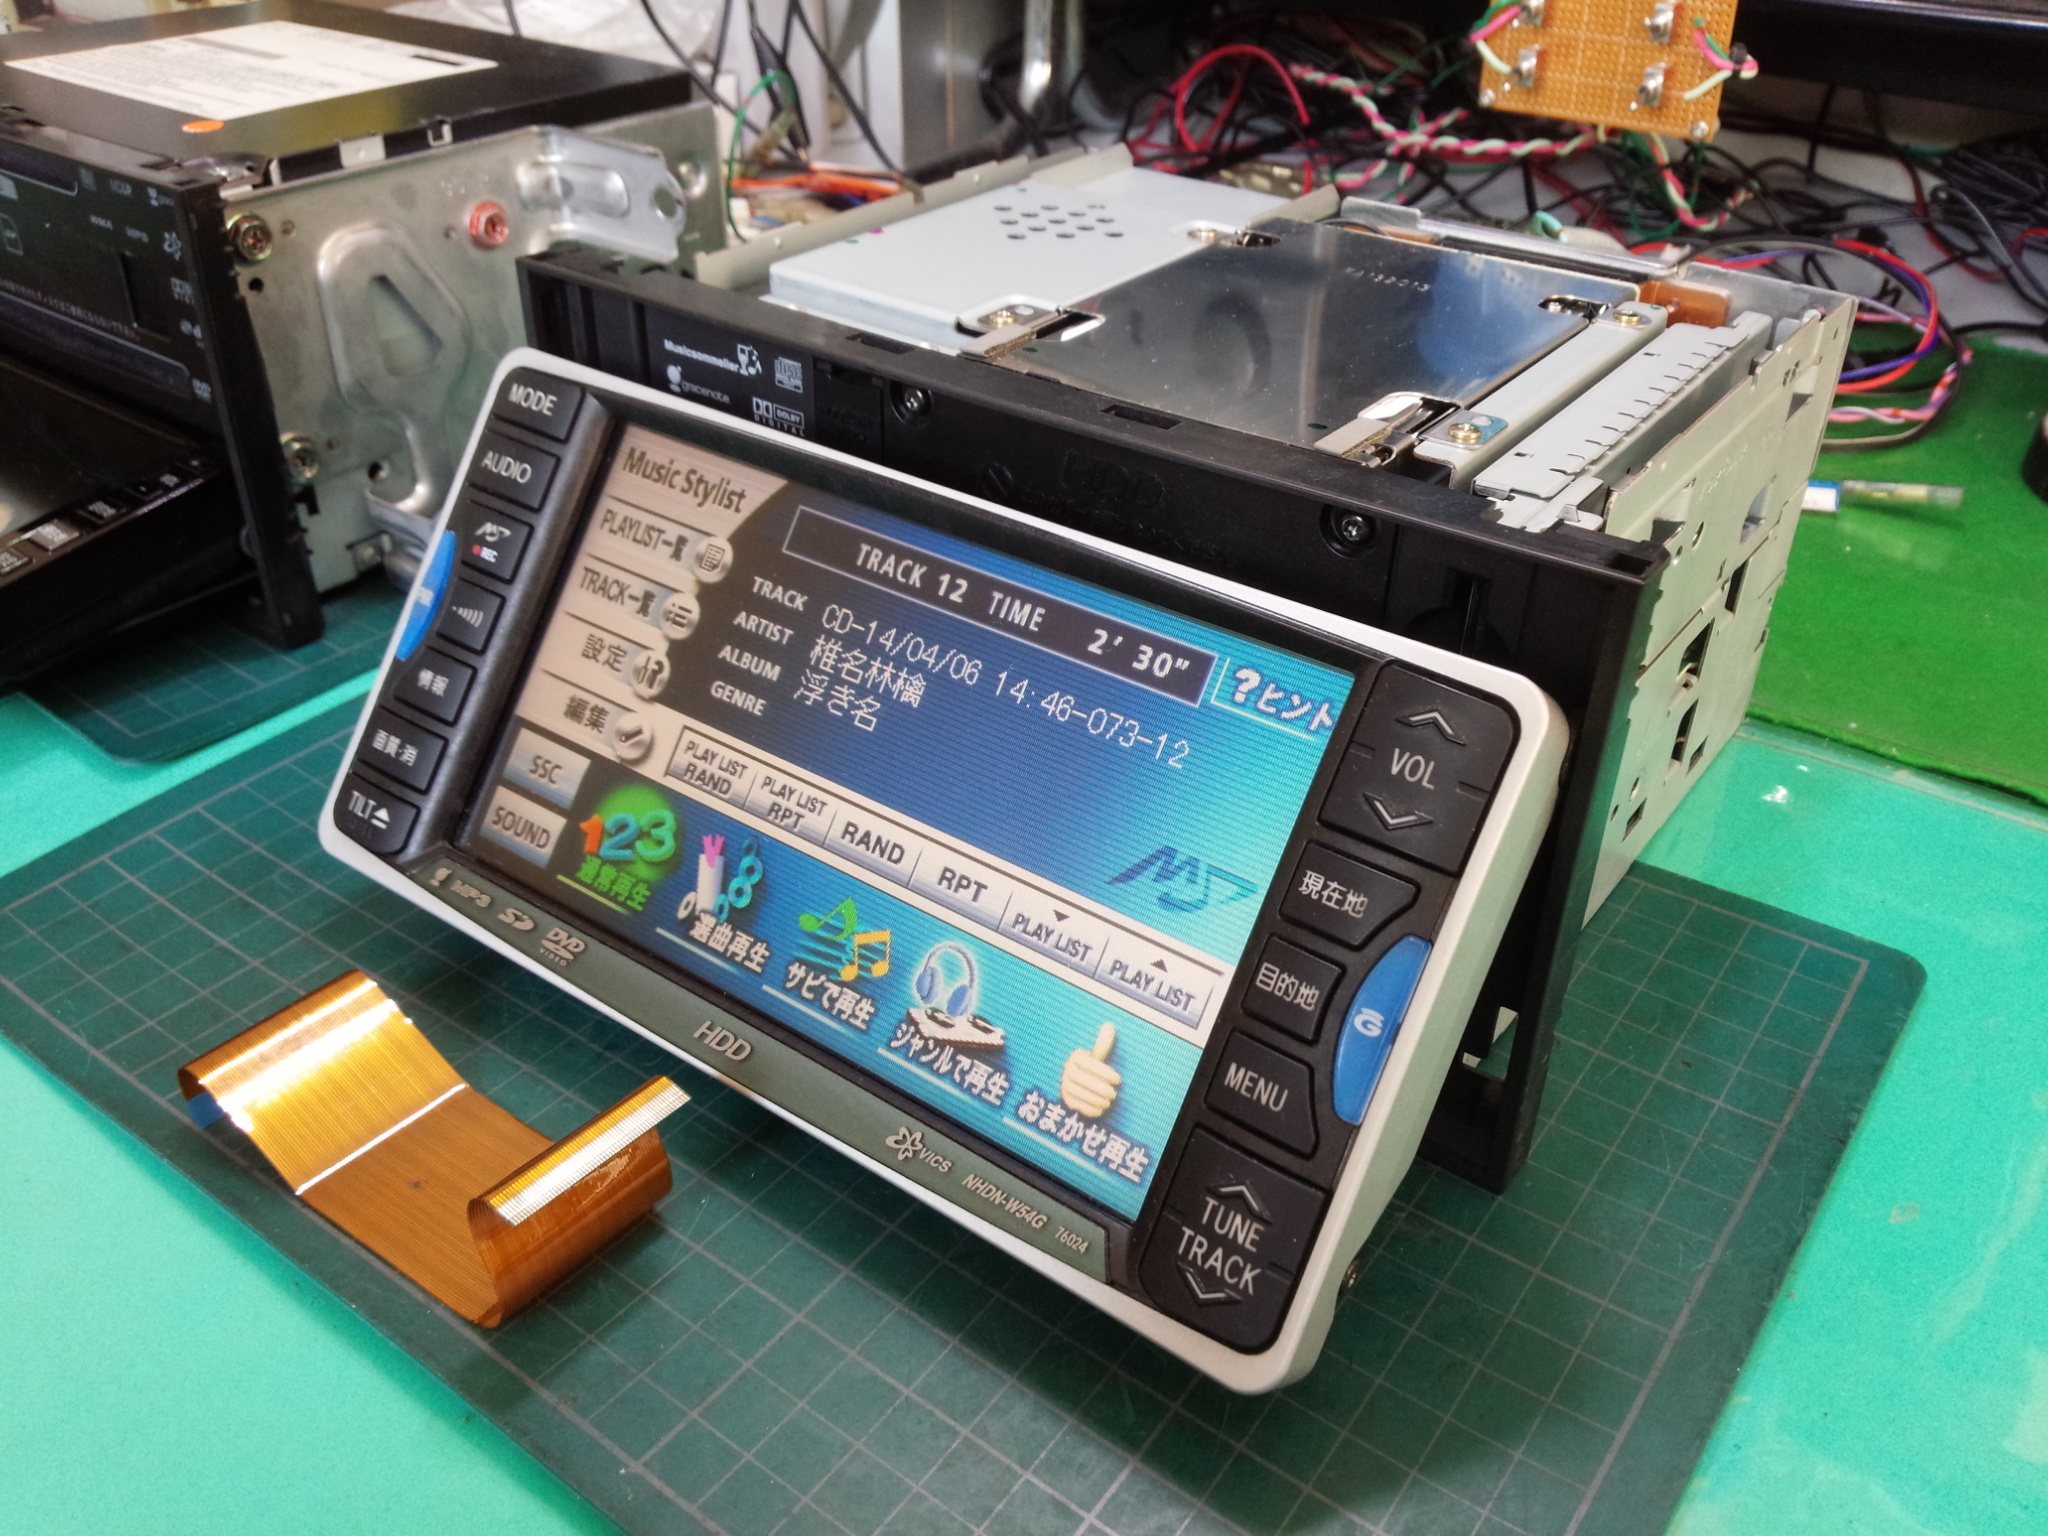 panasonic car dvd nhdn w56 user manual free downloading NEC Dterm 80 Manual NEC Dterm 80 Manual